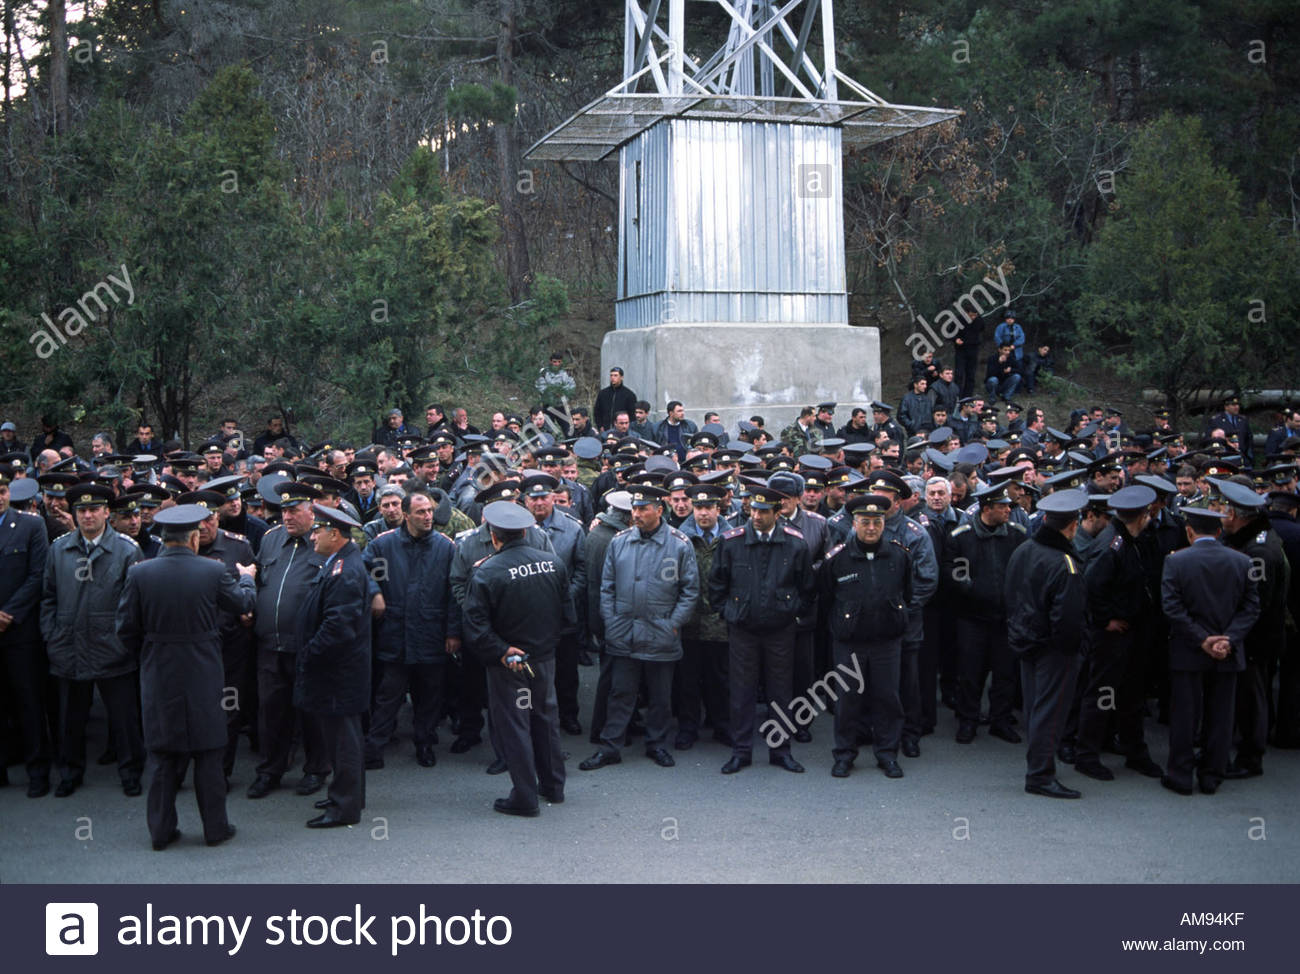 Tbilisi Georgia Police Stock Photos Tbilisi Georgia